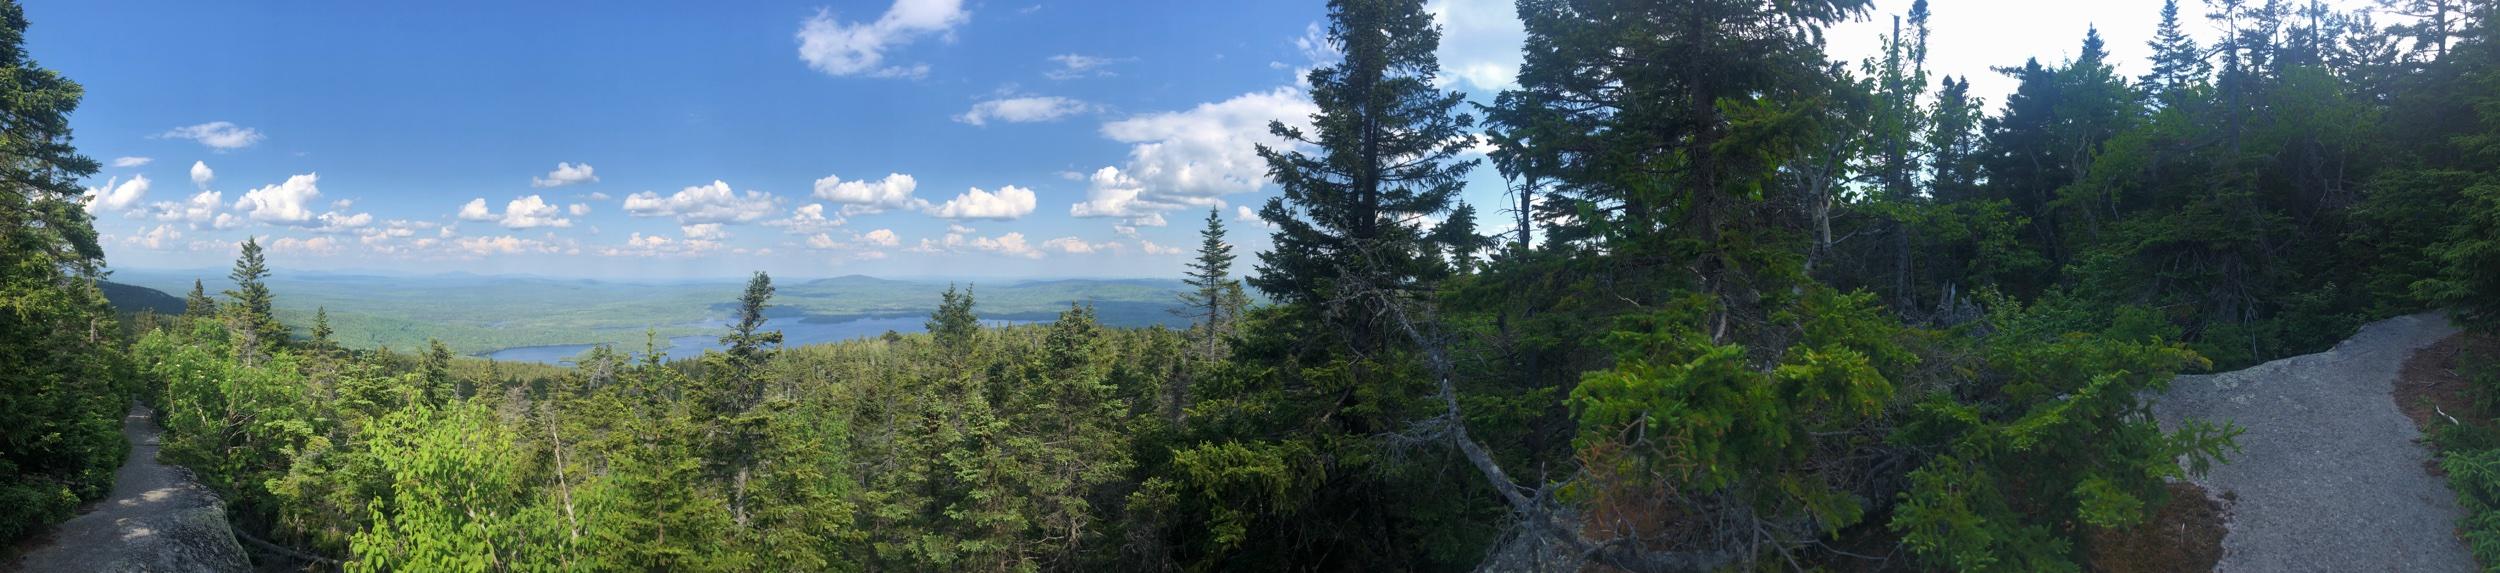 Climbing Moxie Mountain